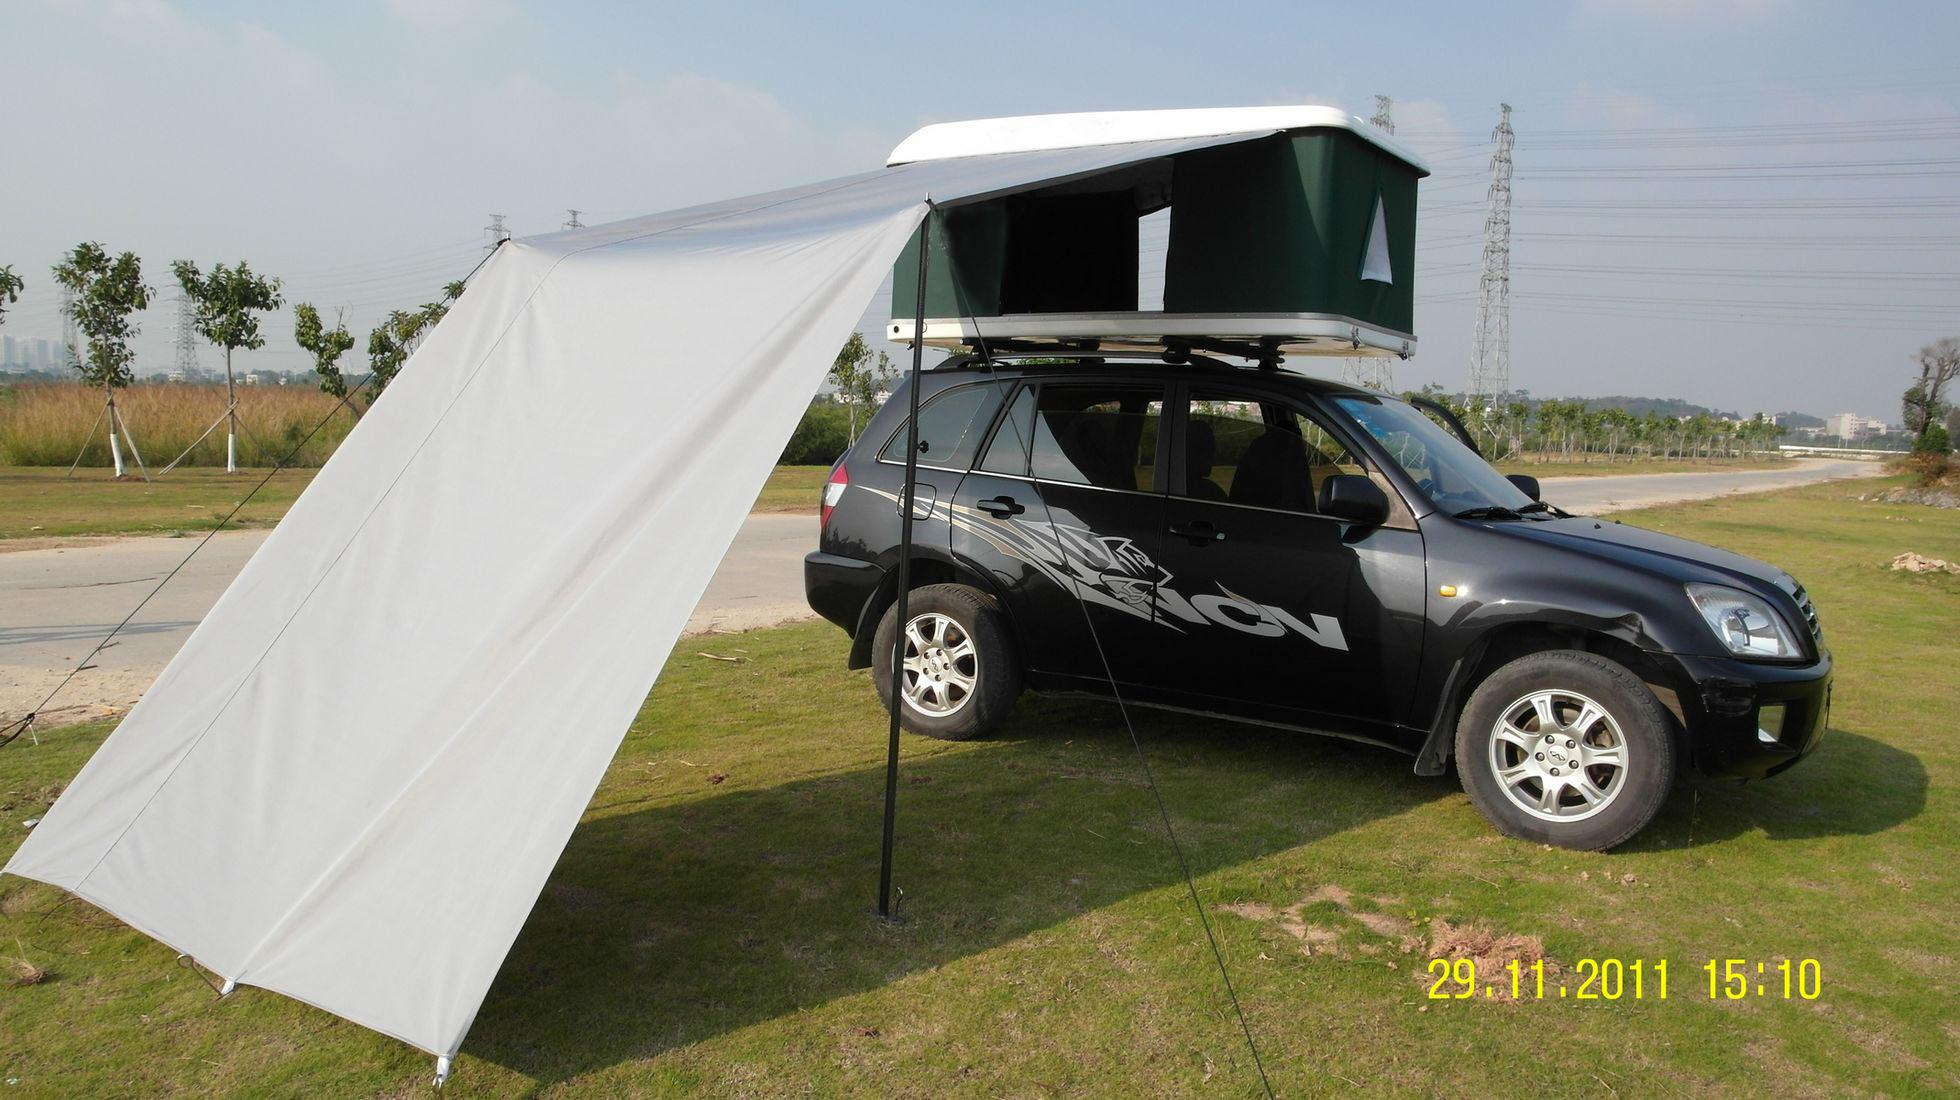 Тент на багажник на крышу автомобиля своими руками